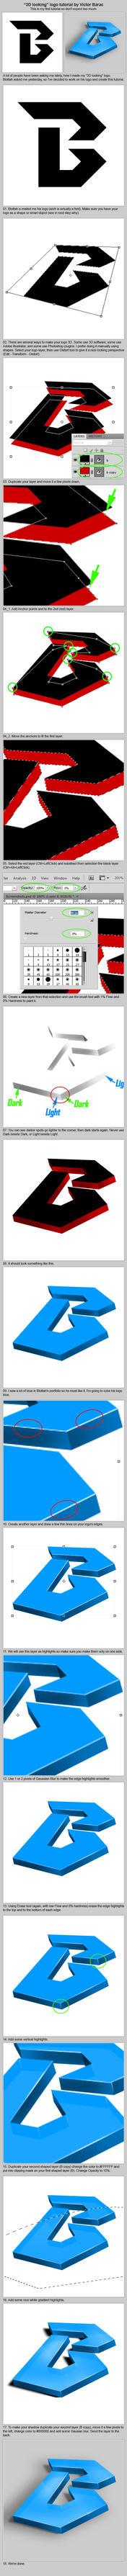 3D logo tutorial by victorbarac